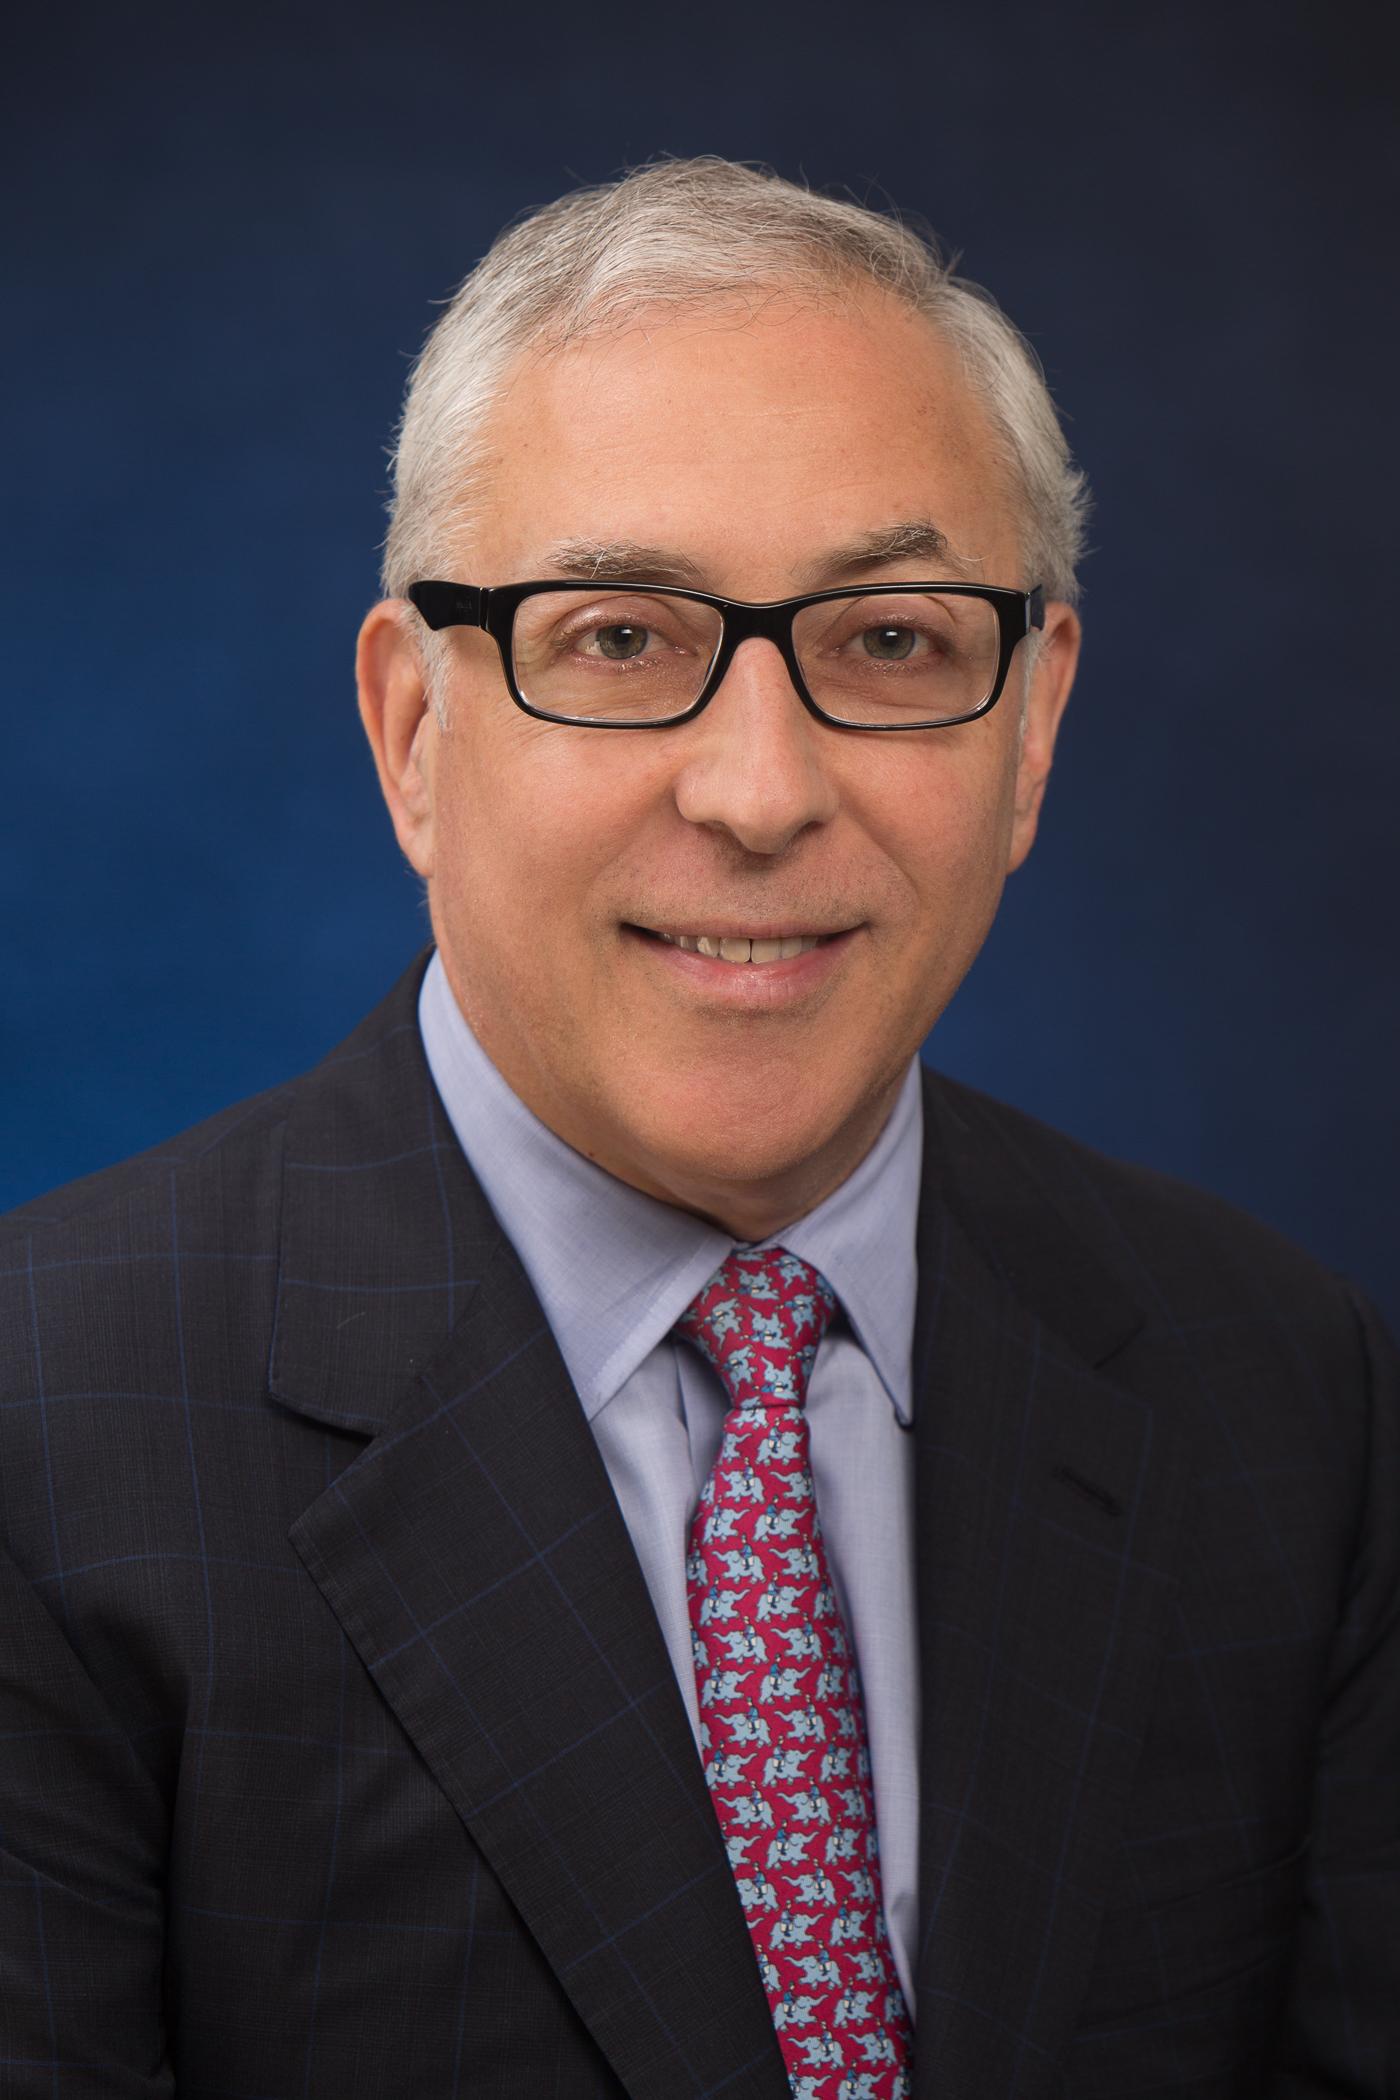 David Sherman '82